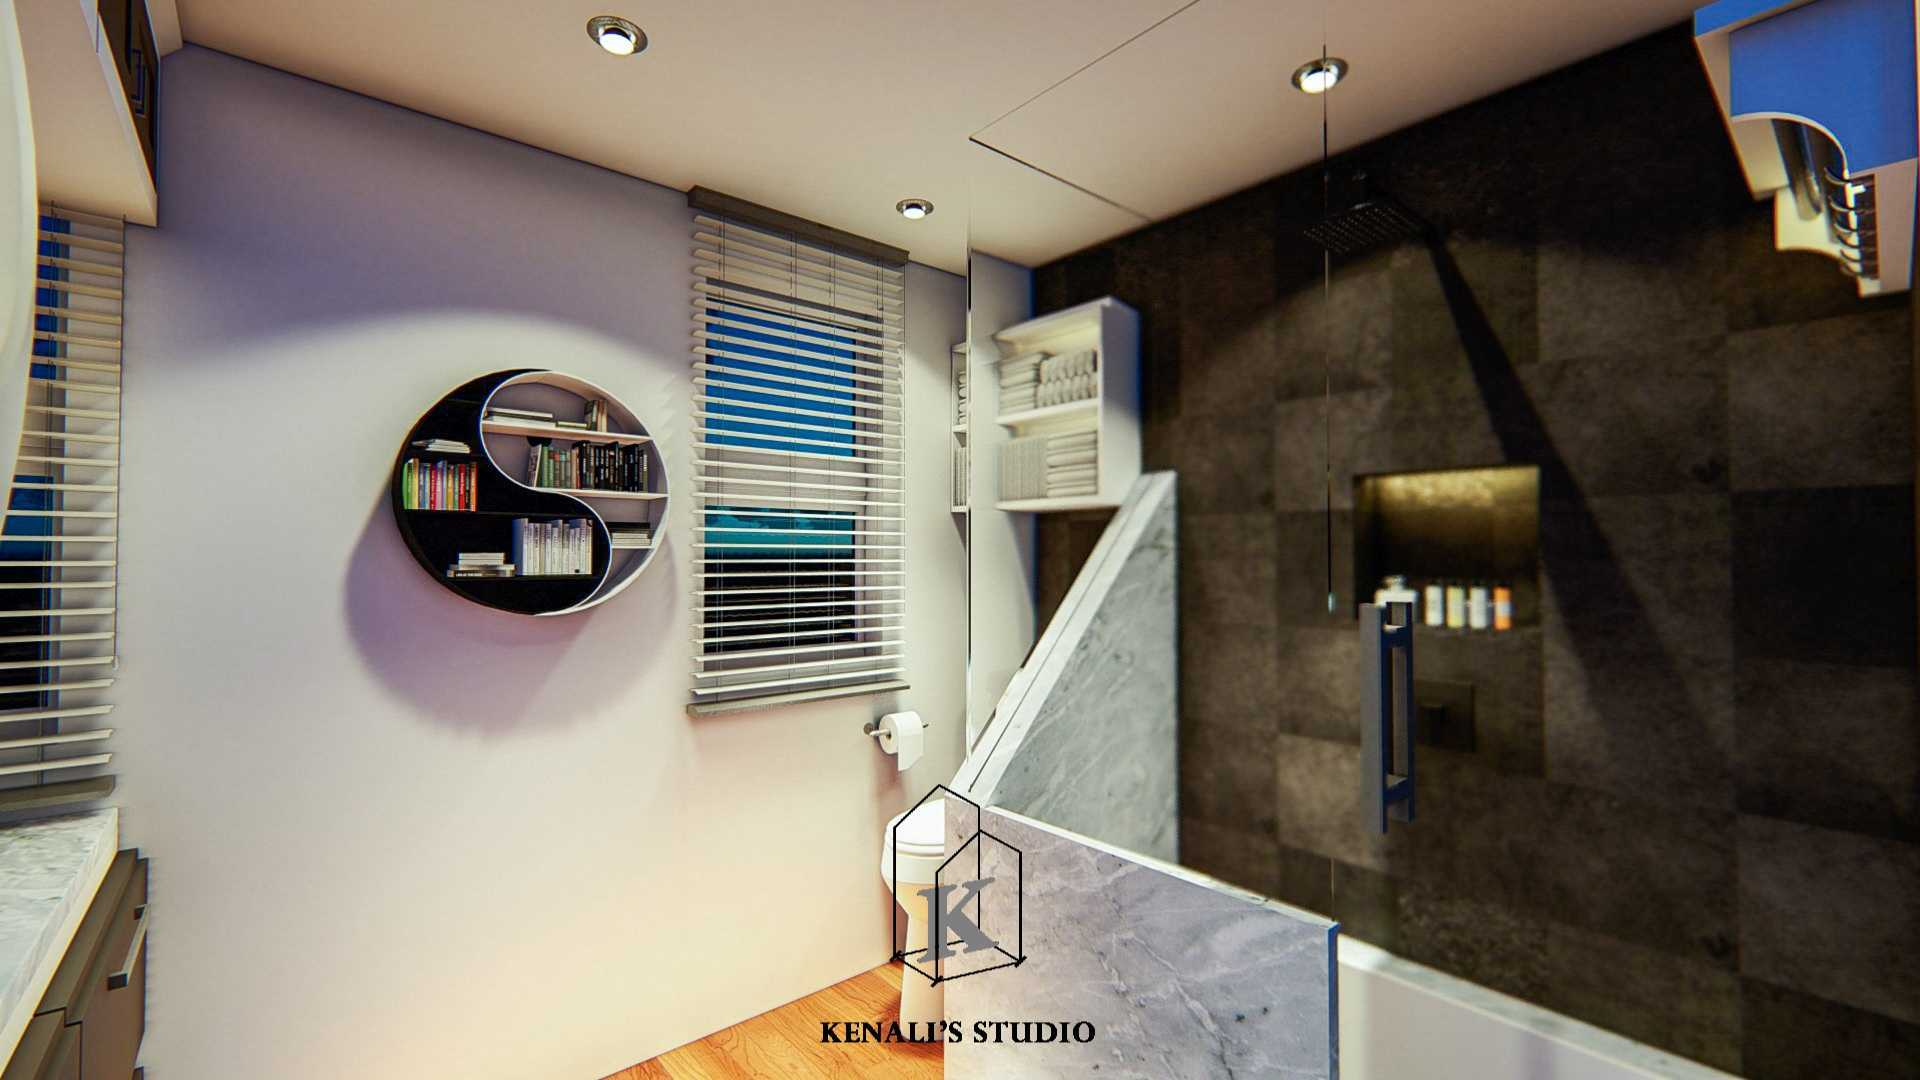 Kenali's Studio Project : Laundry & Bathroom Amerika Serikat Amerika Serikat Kenalis-Studio-Project-Laundry-Bathroom   72918